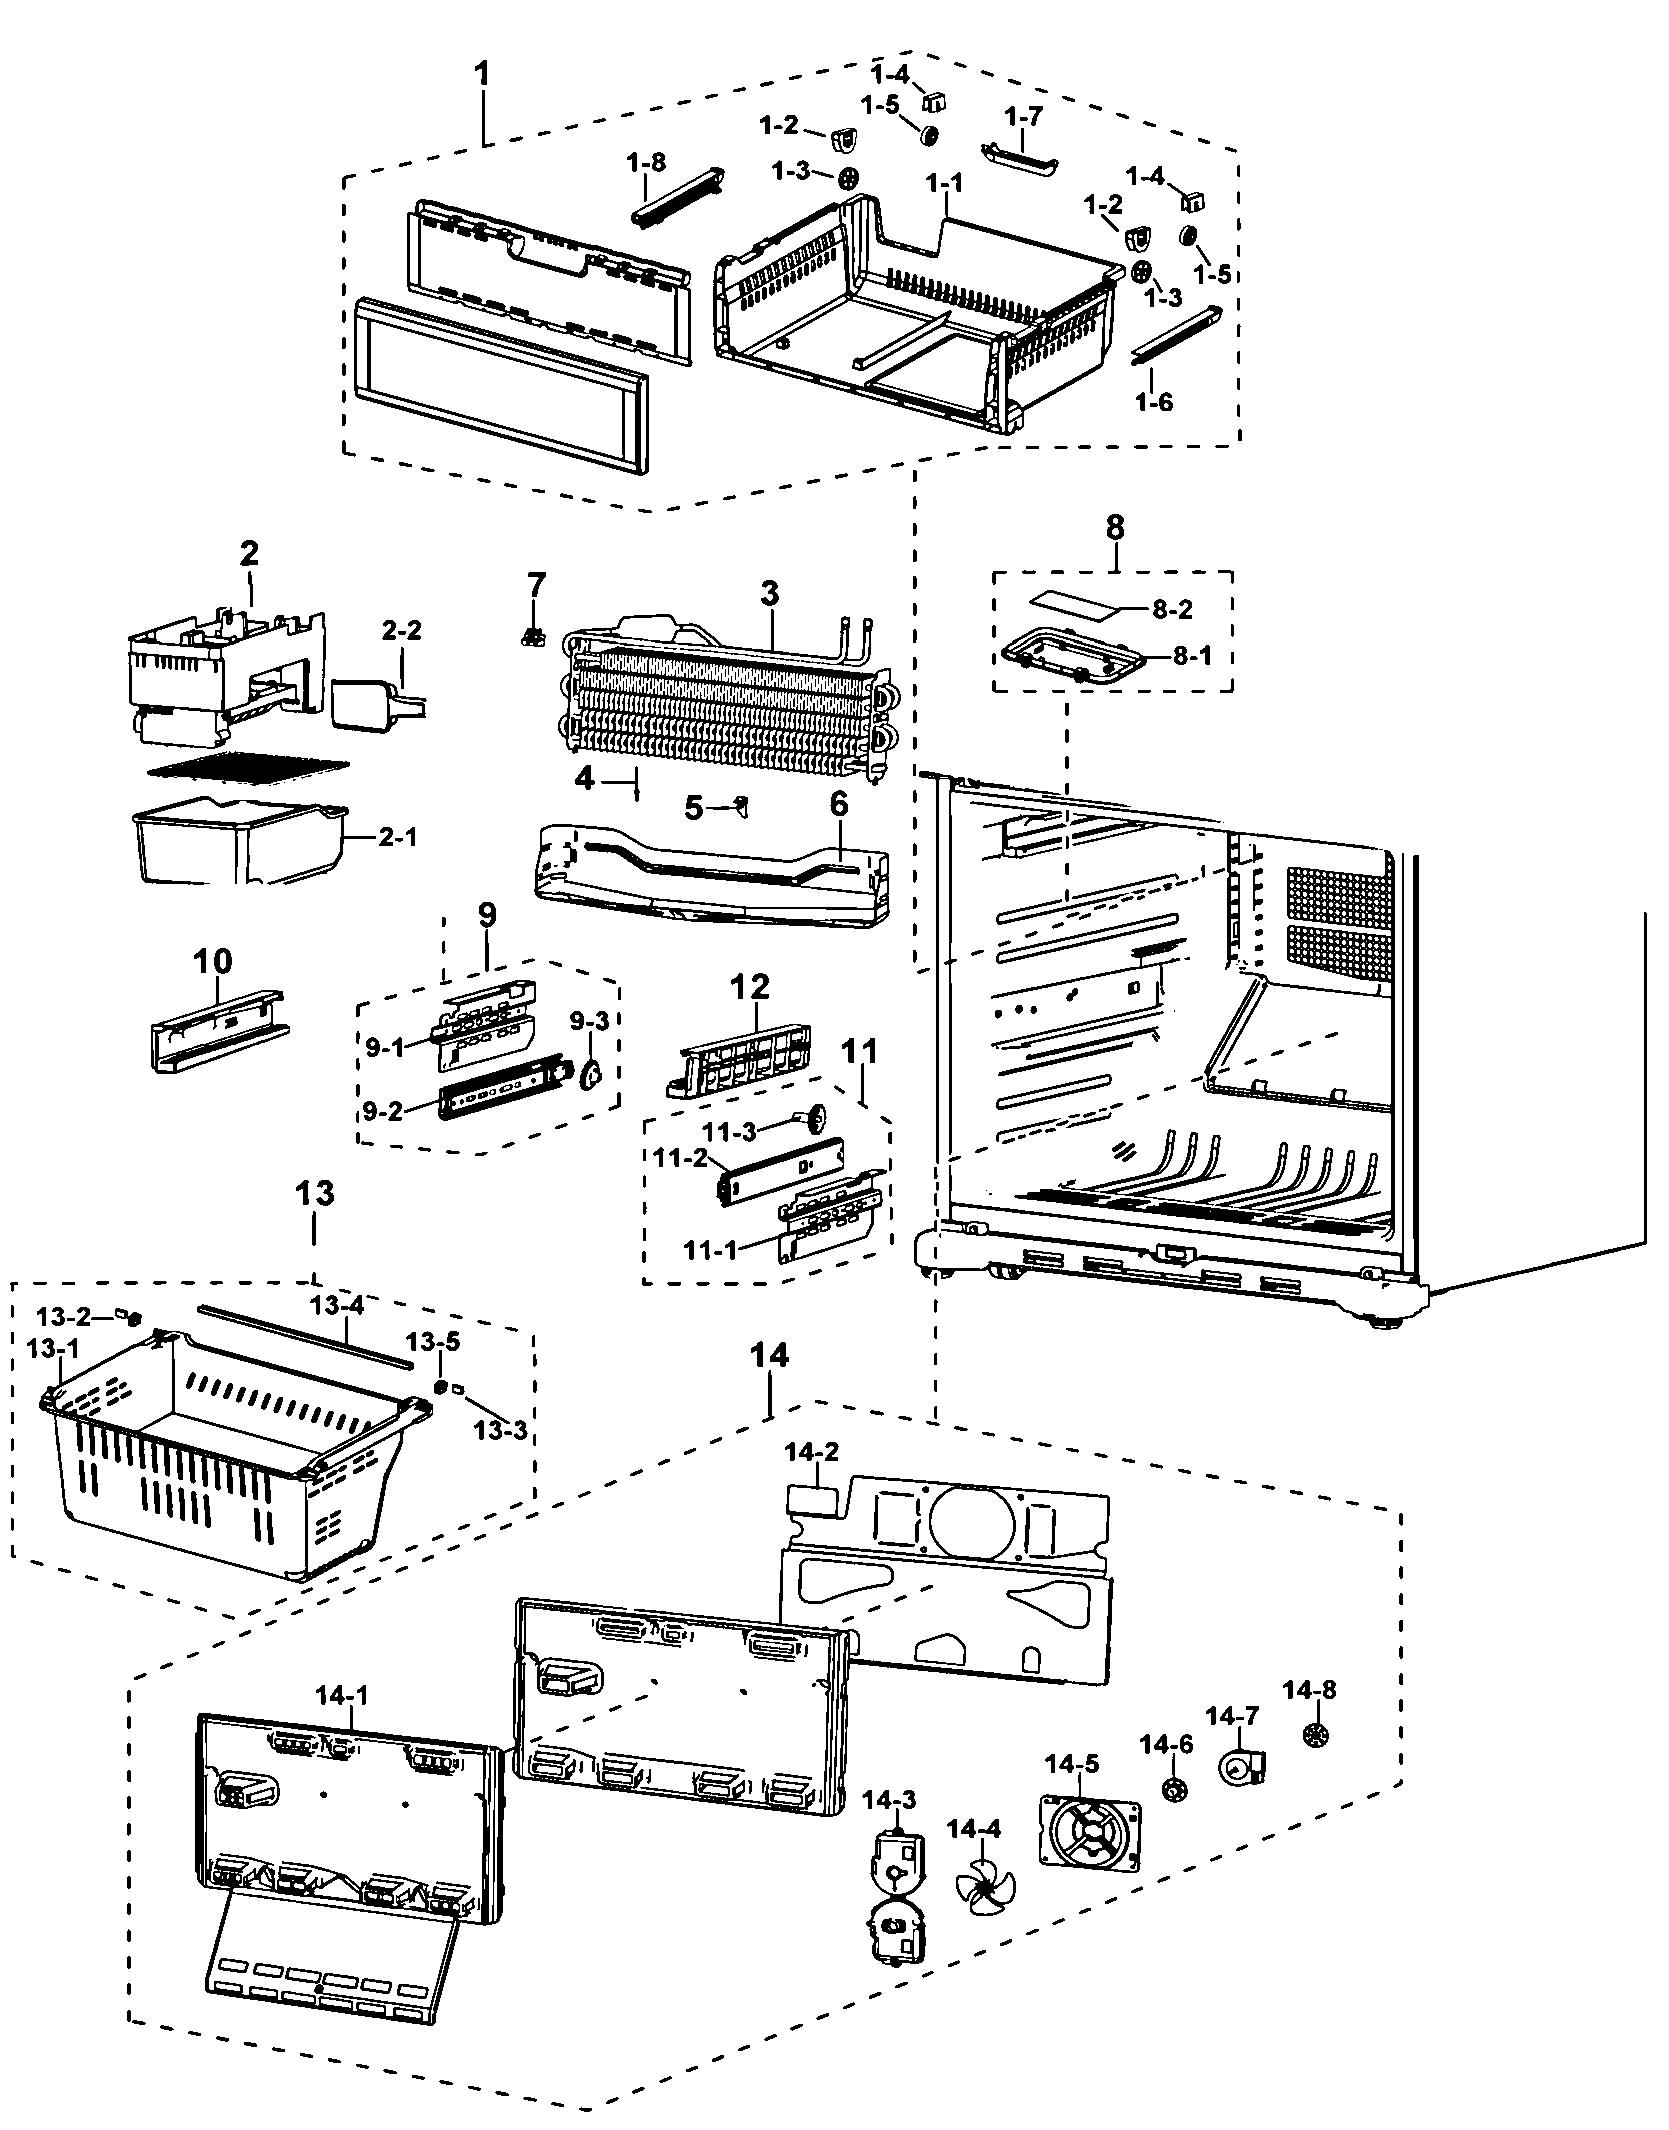 Samsung model RF197ACRS/XAA-00 bottom-mount refrigerator